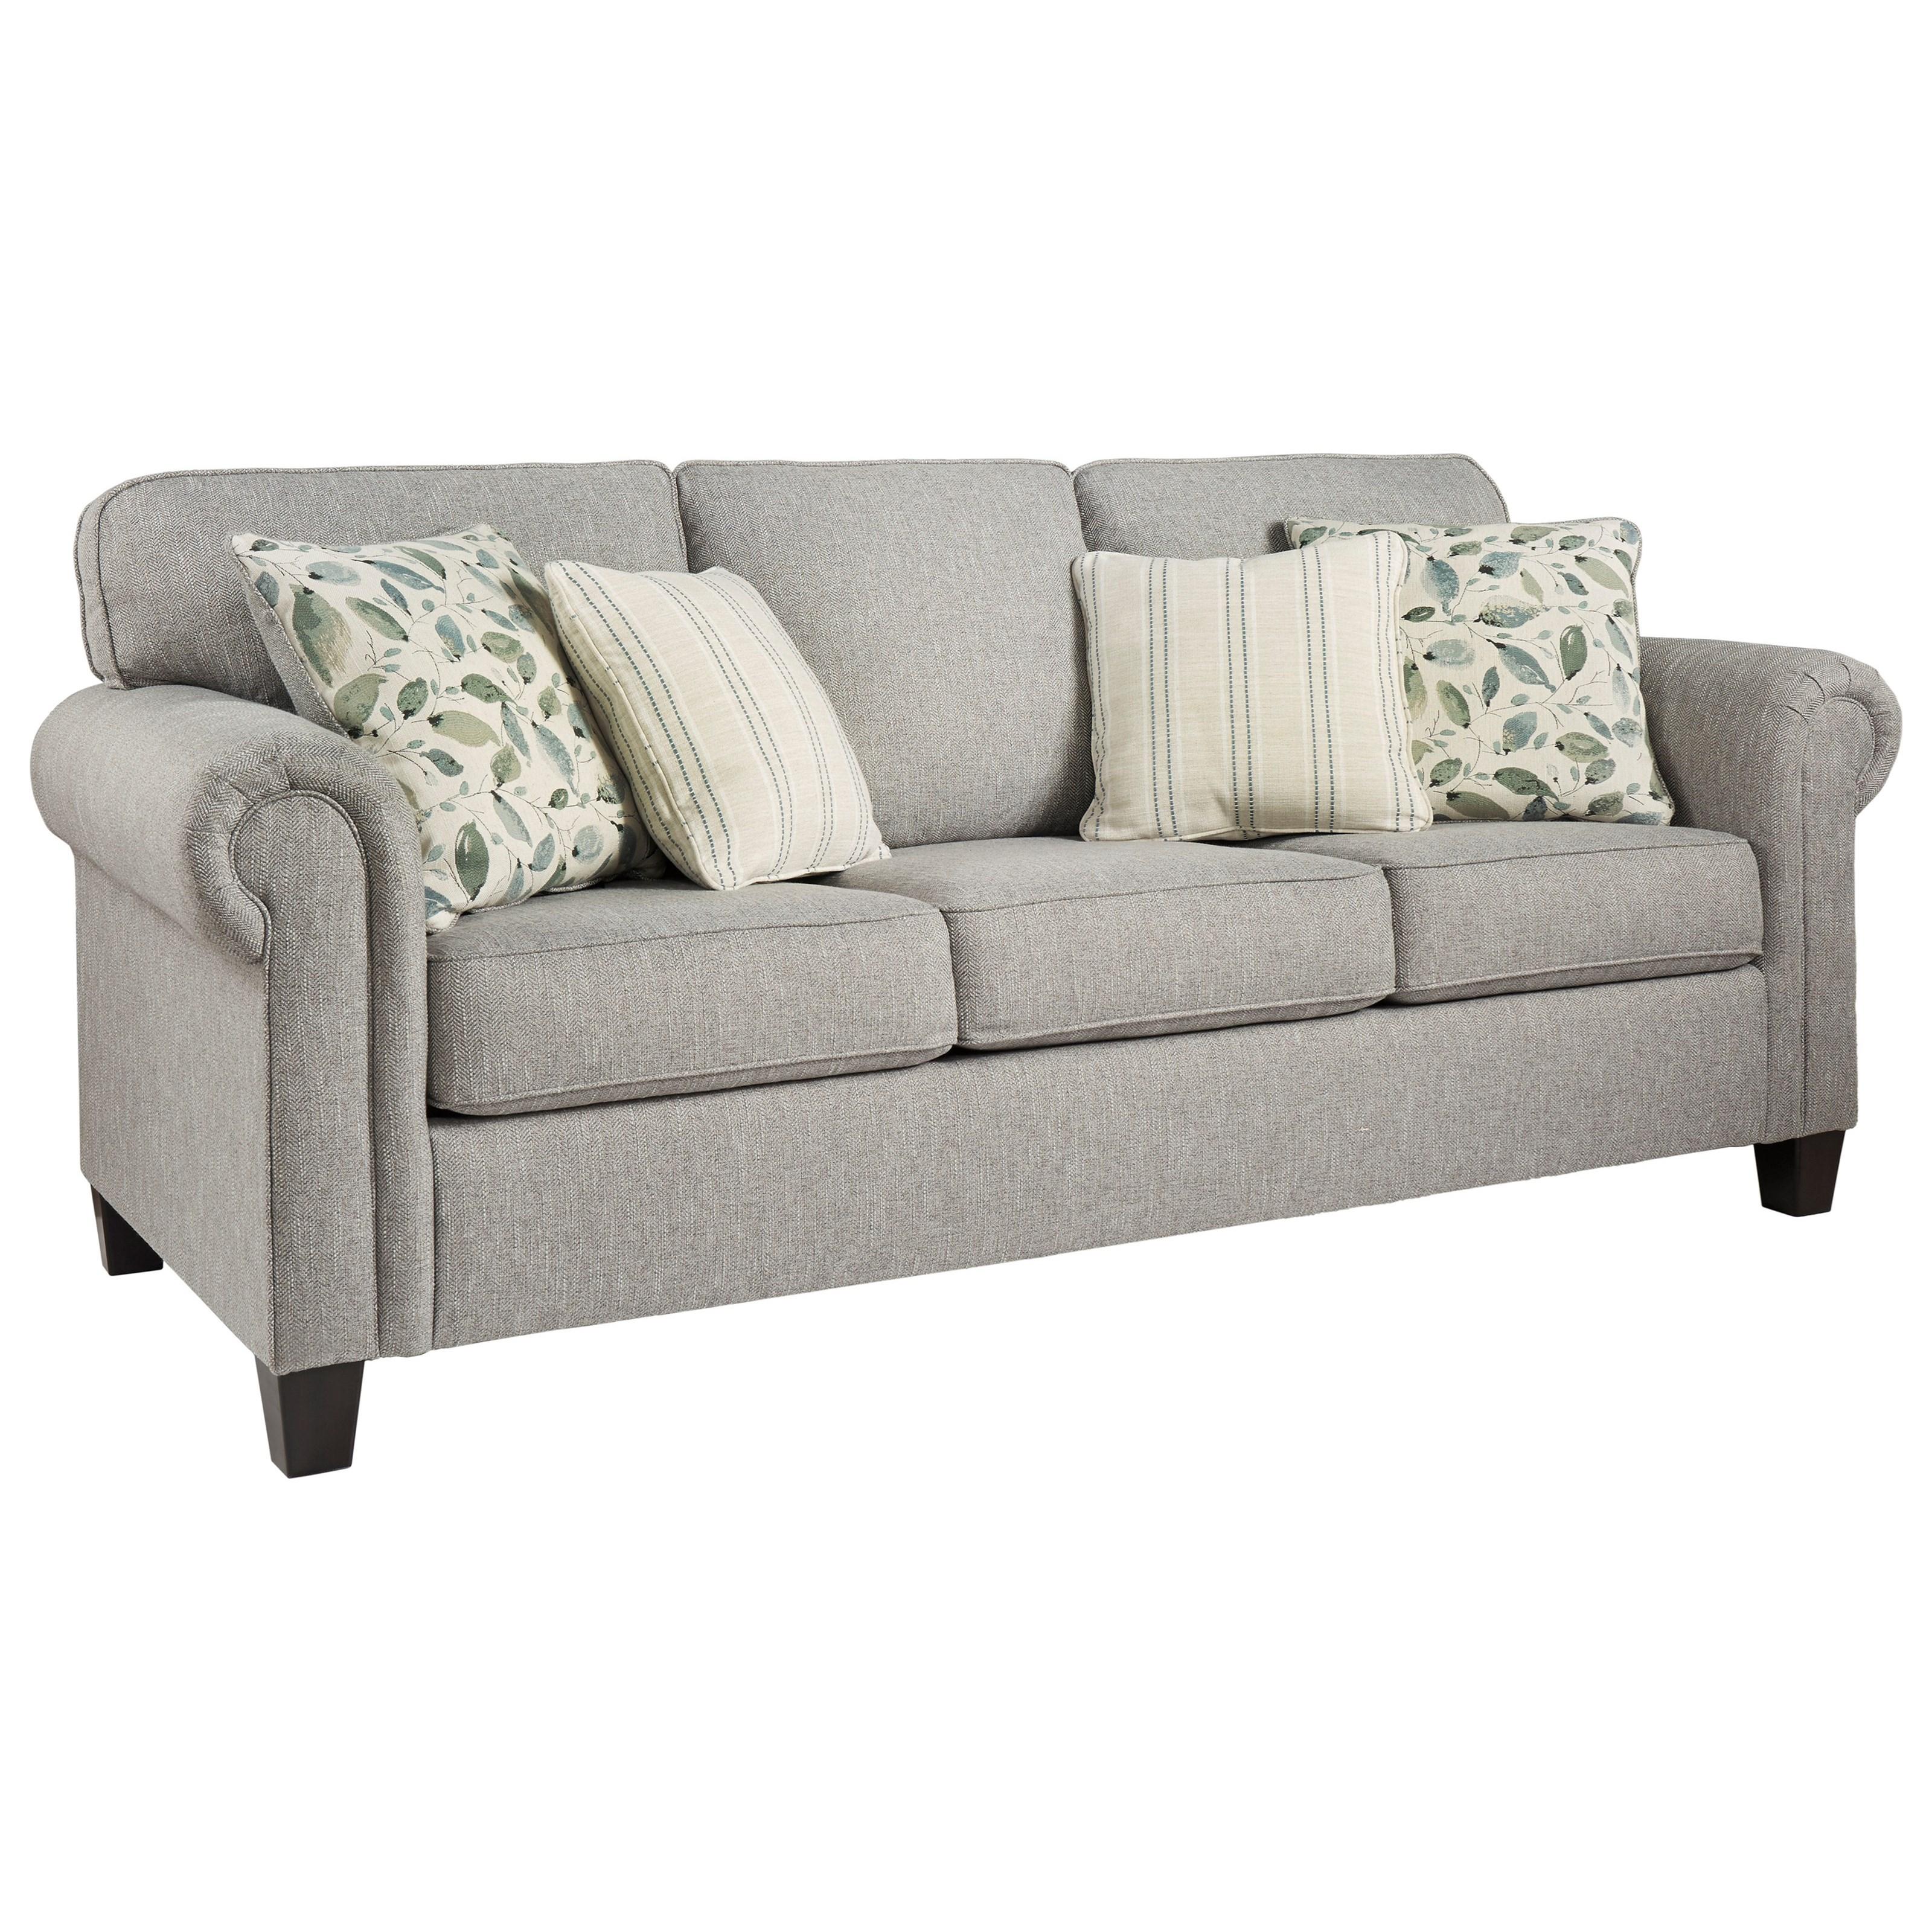 Ashley Furniture With Prices: Ashley Signature Design Alandari 9890938 Transitional Sofa